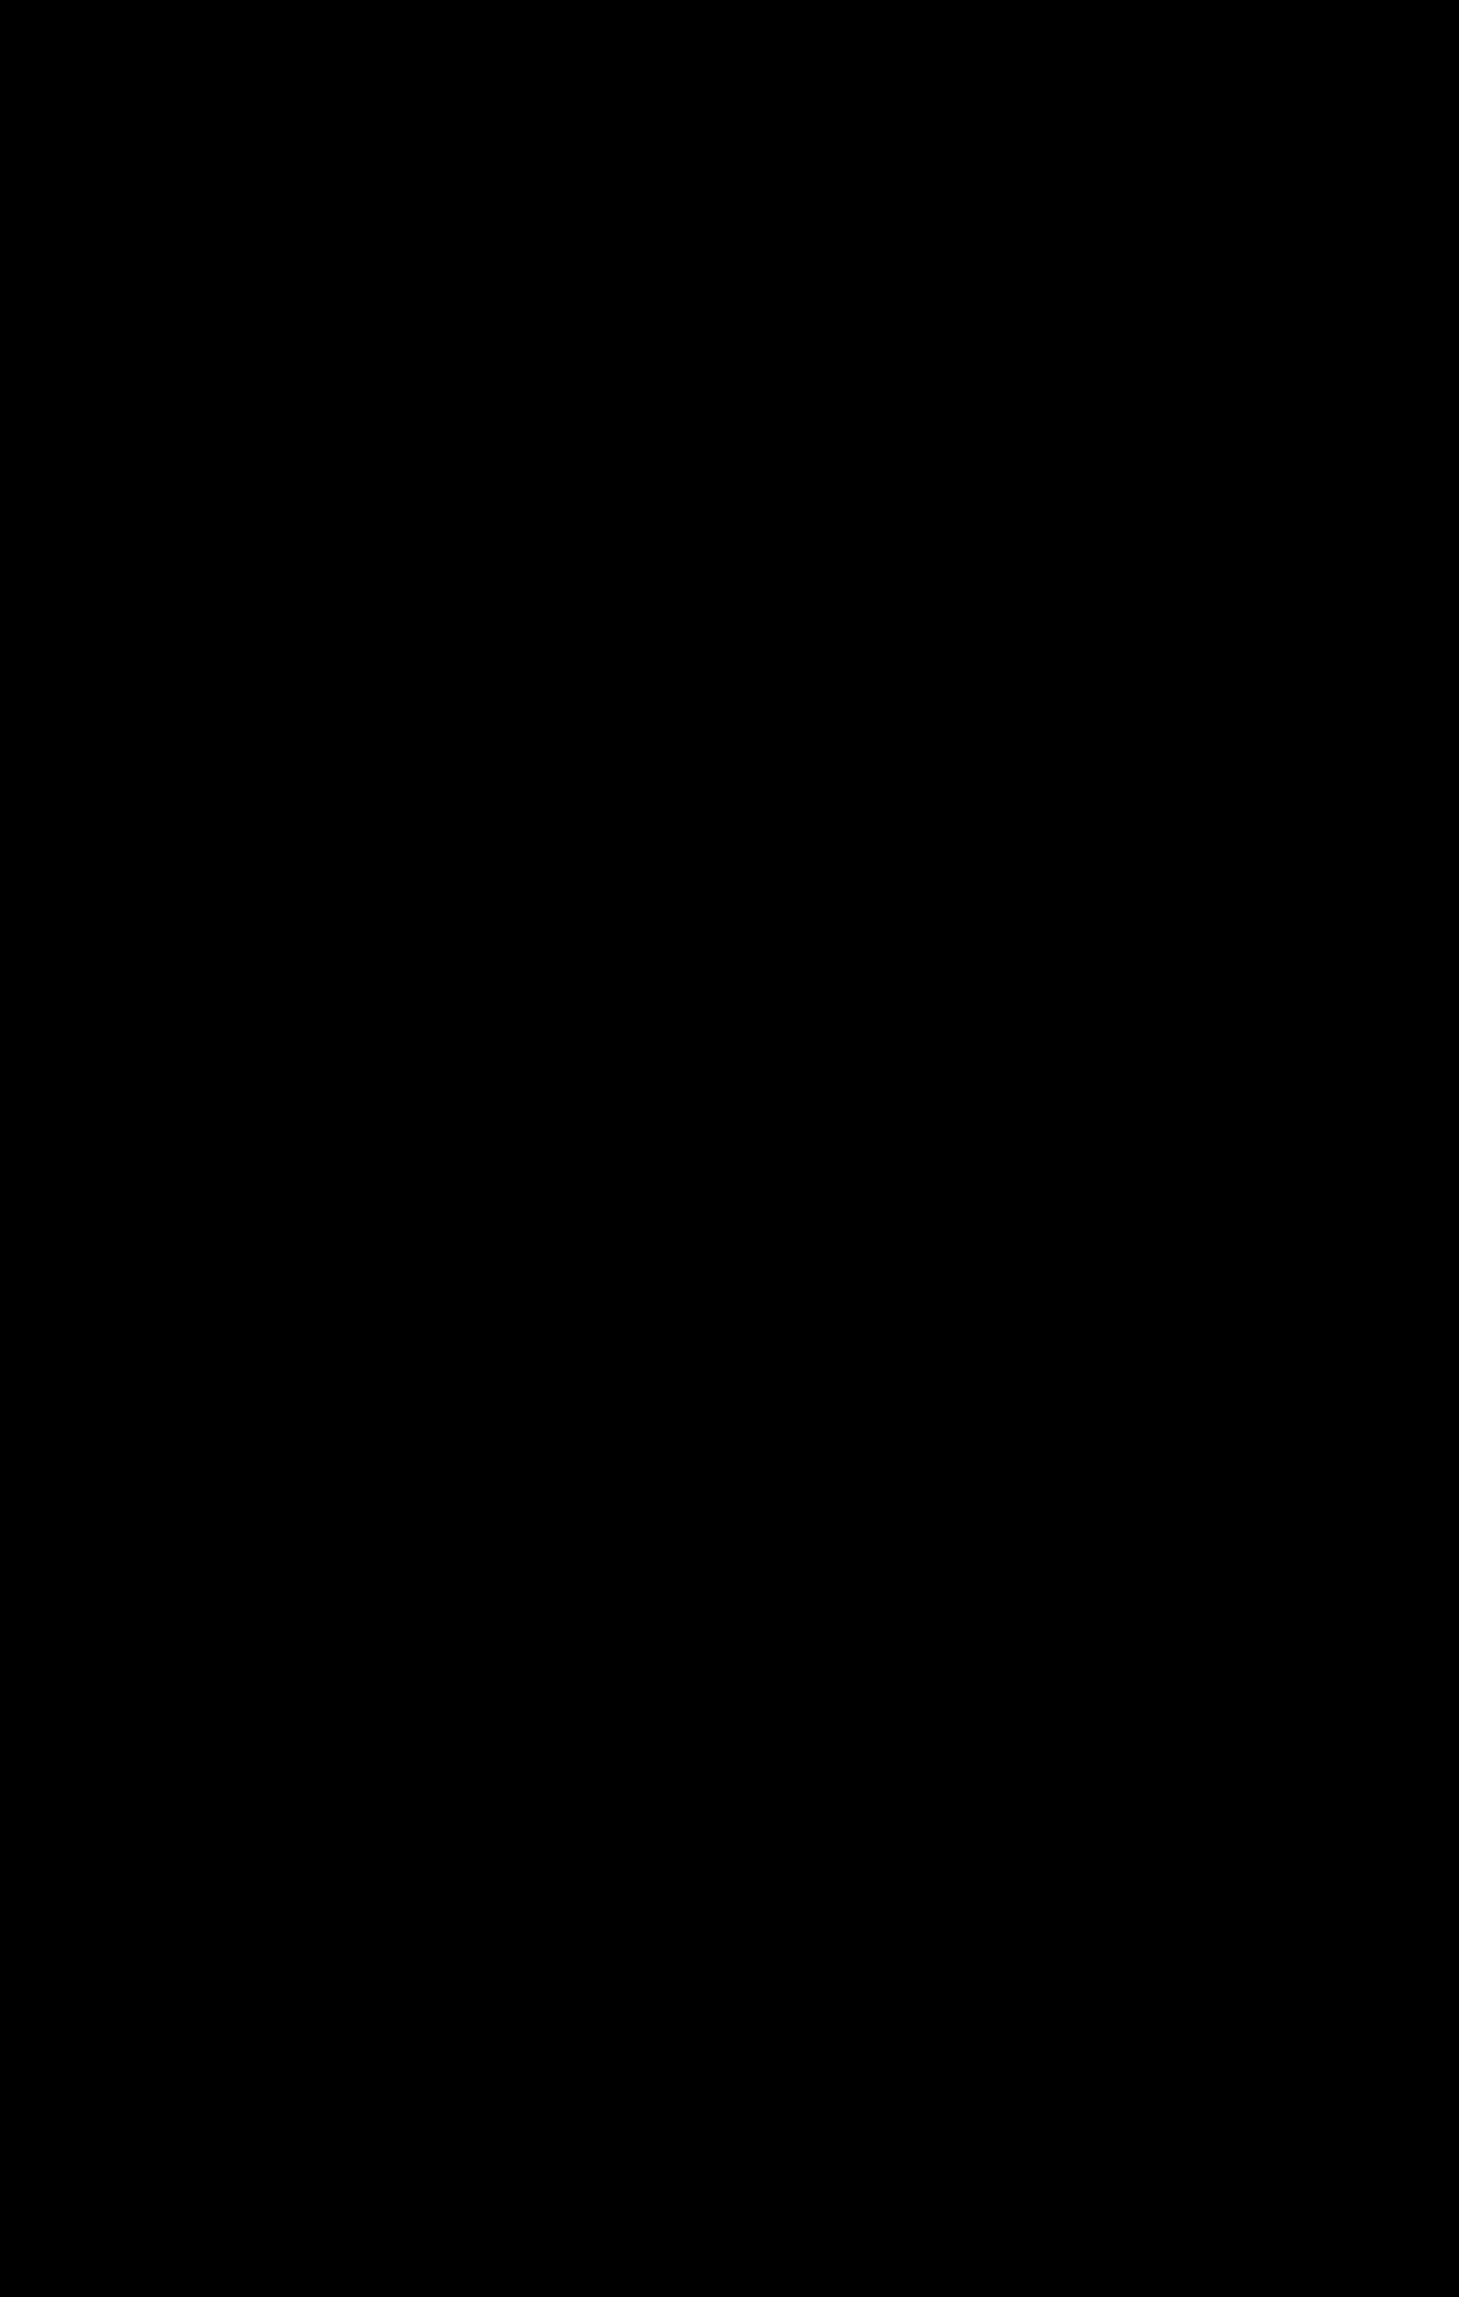 1459x2297 Clipart